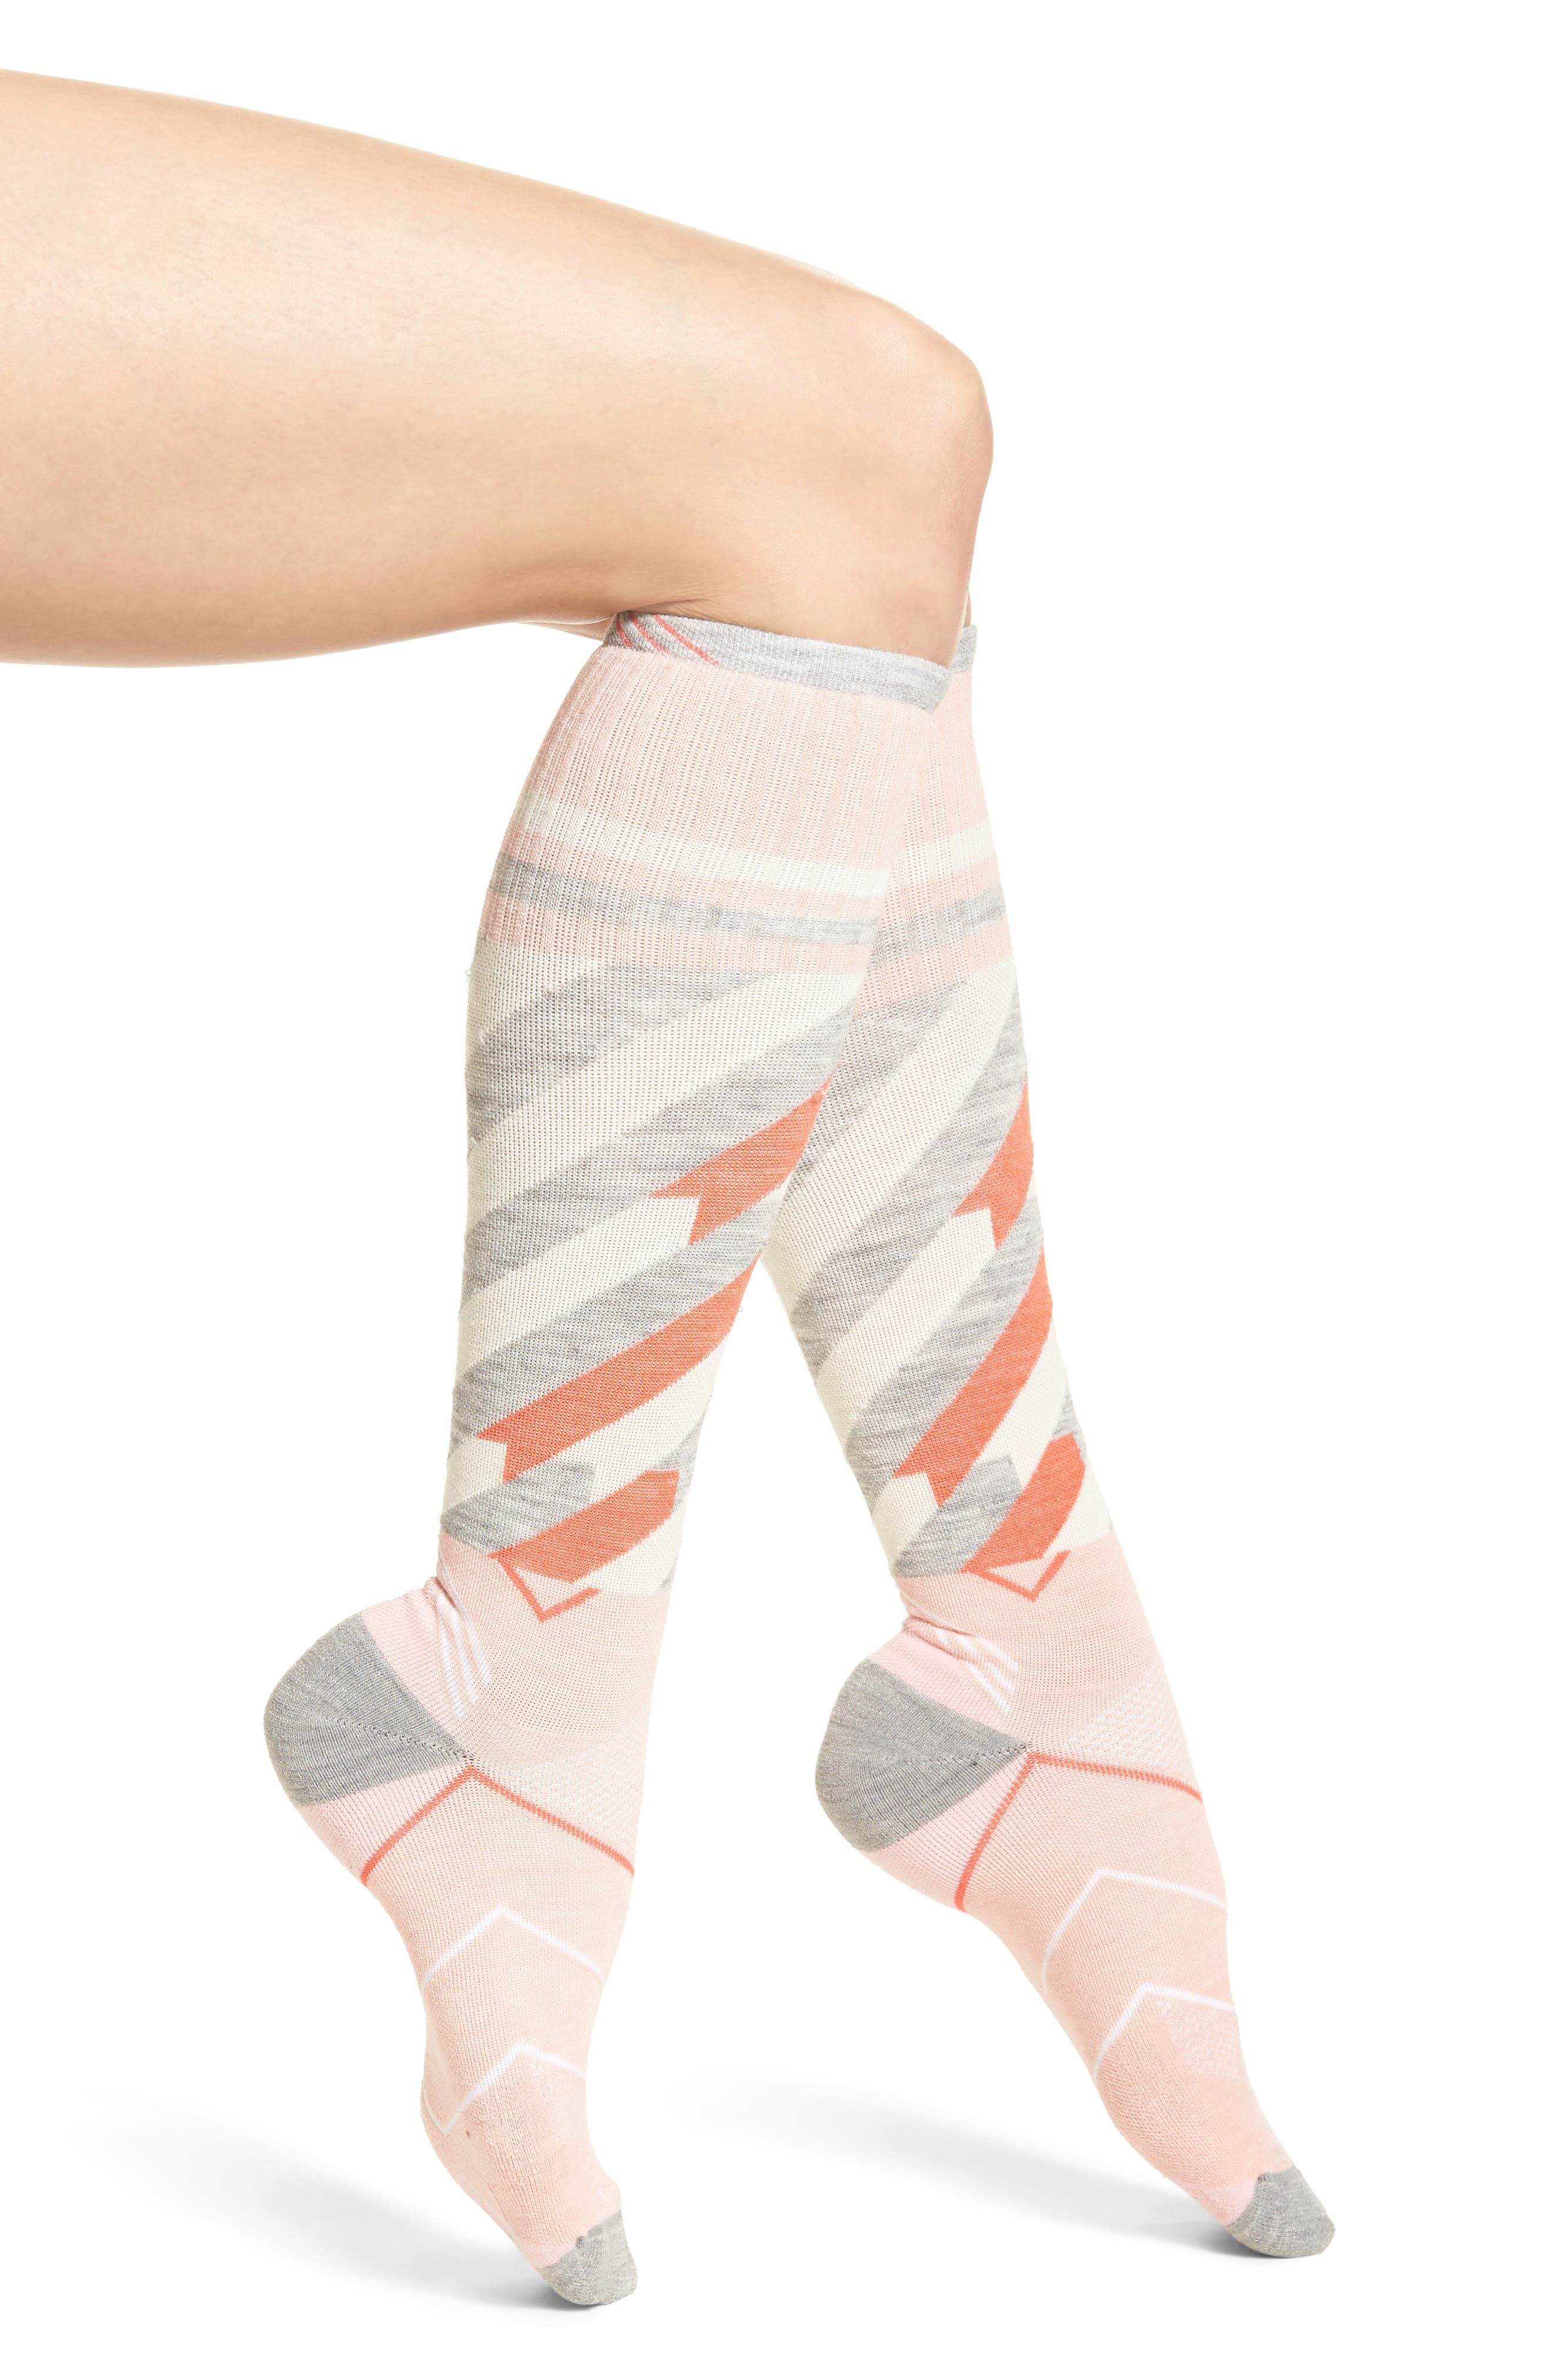 Cyclone Compression Knee Socks,                             Main thumbnail 1, color,                             650